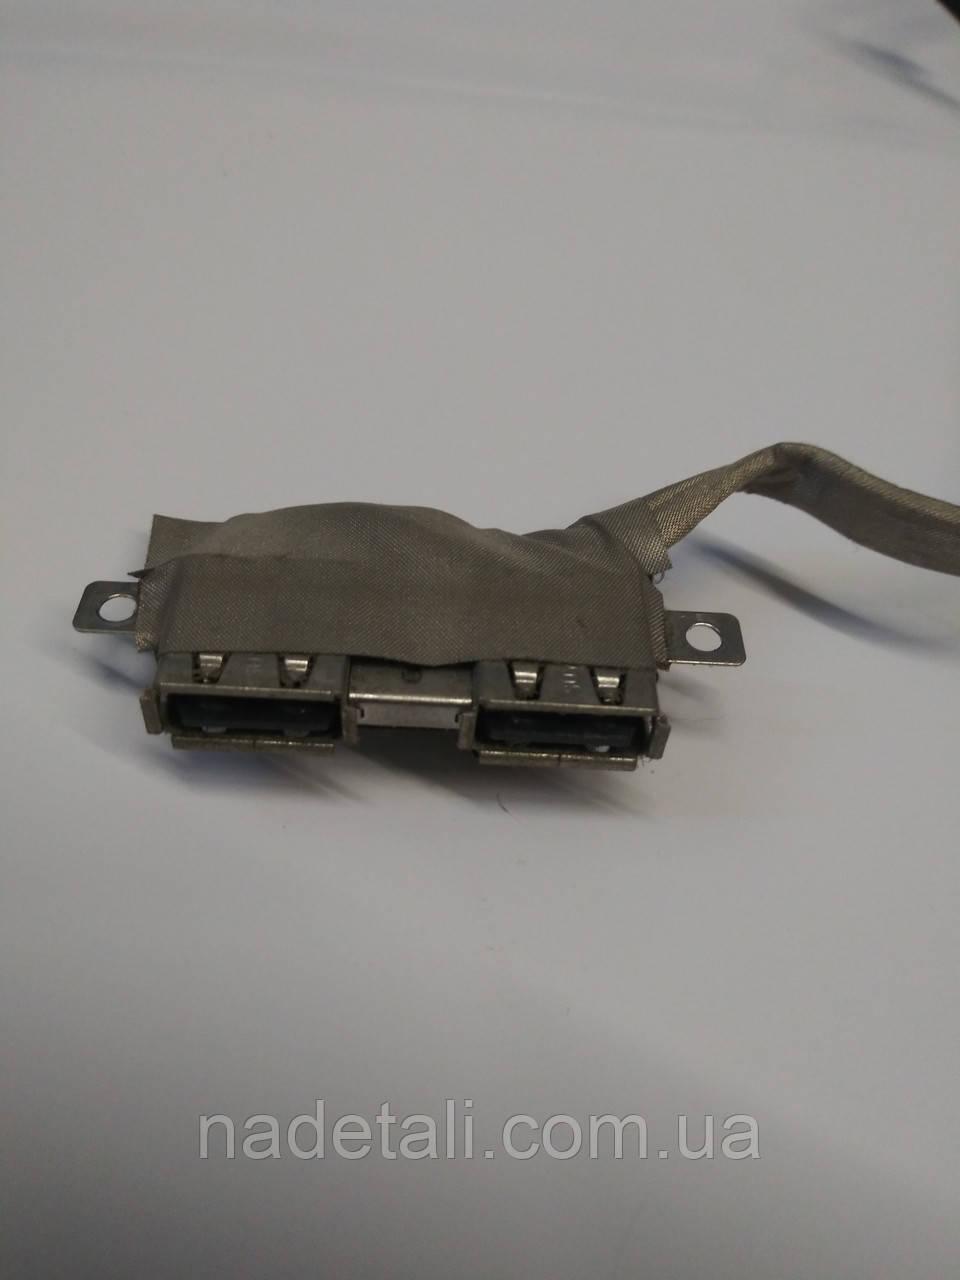 Плата USB Asus K50AF 14G140275302